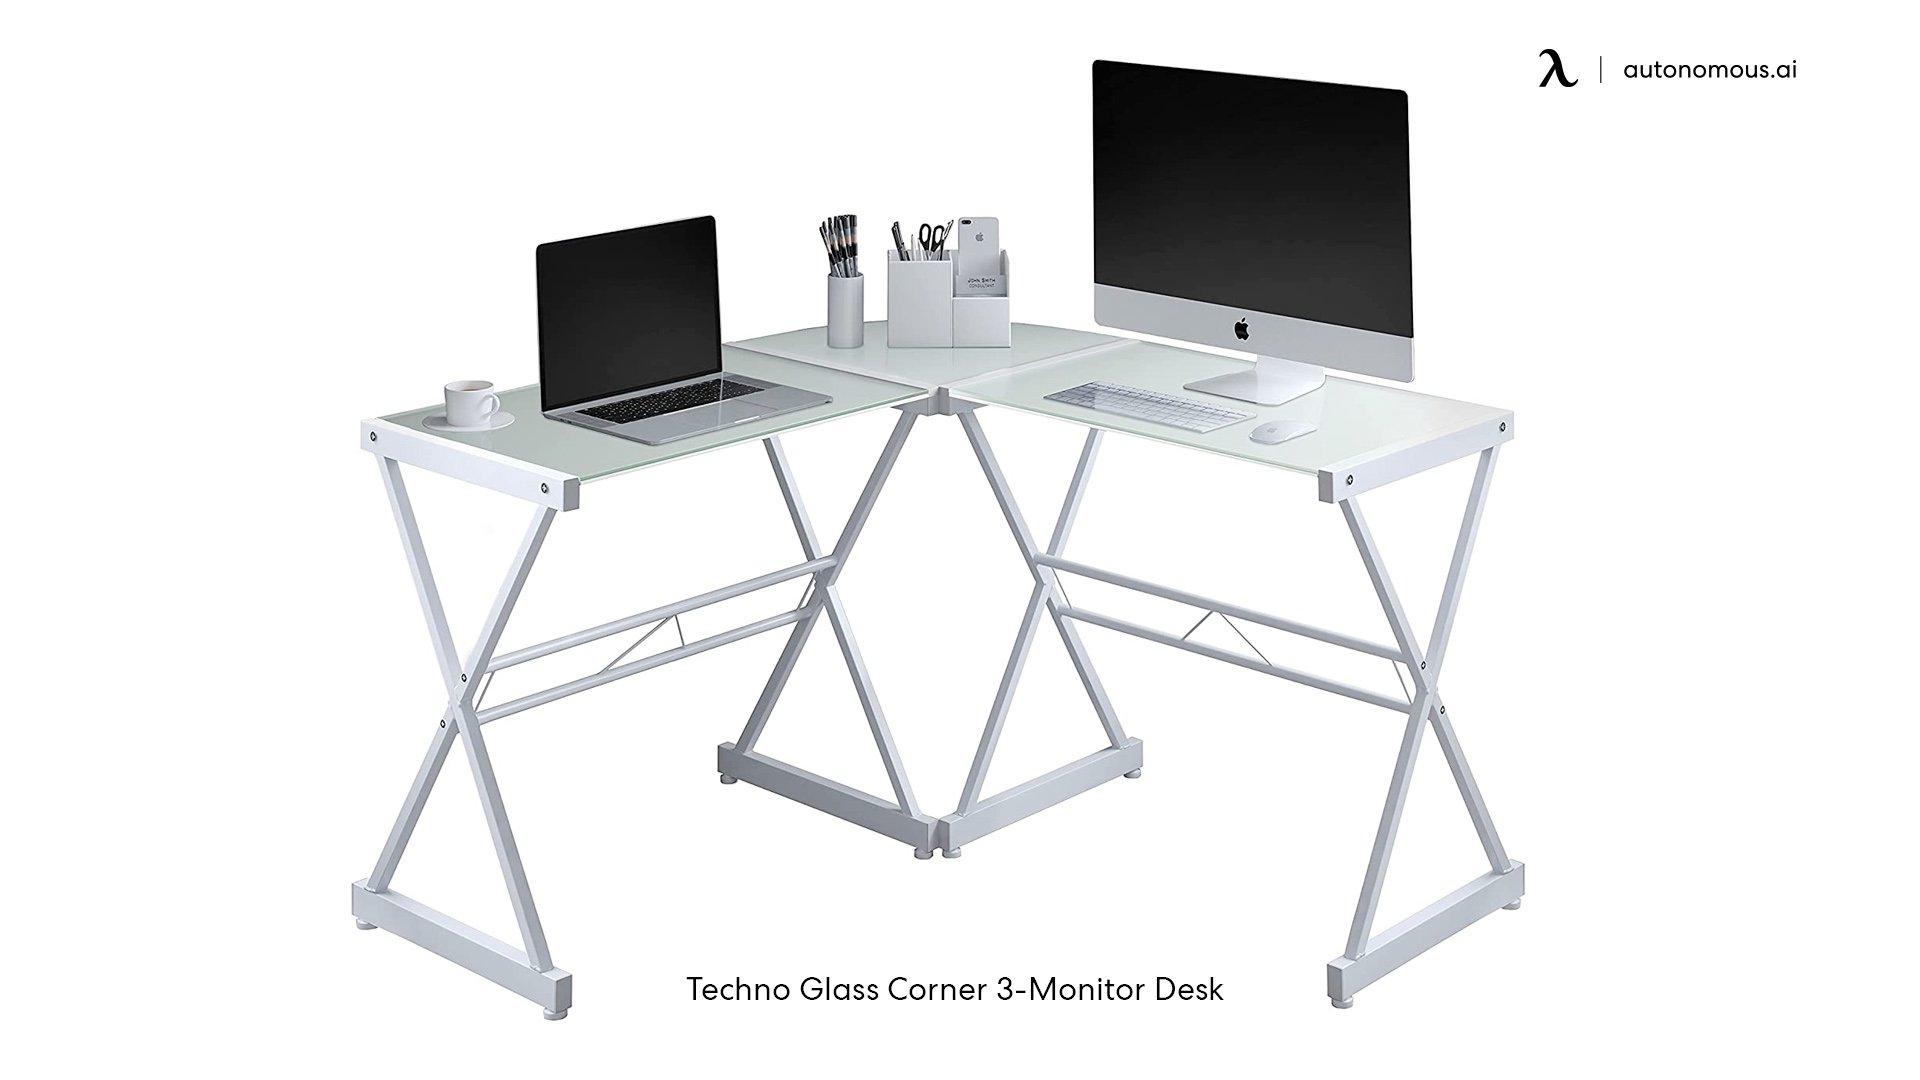 Techno Glass Corner 3-Monitor Desk